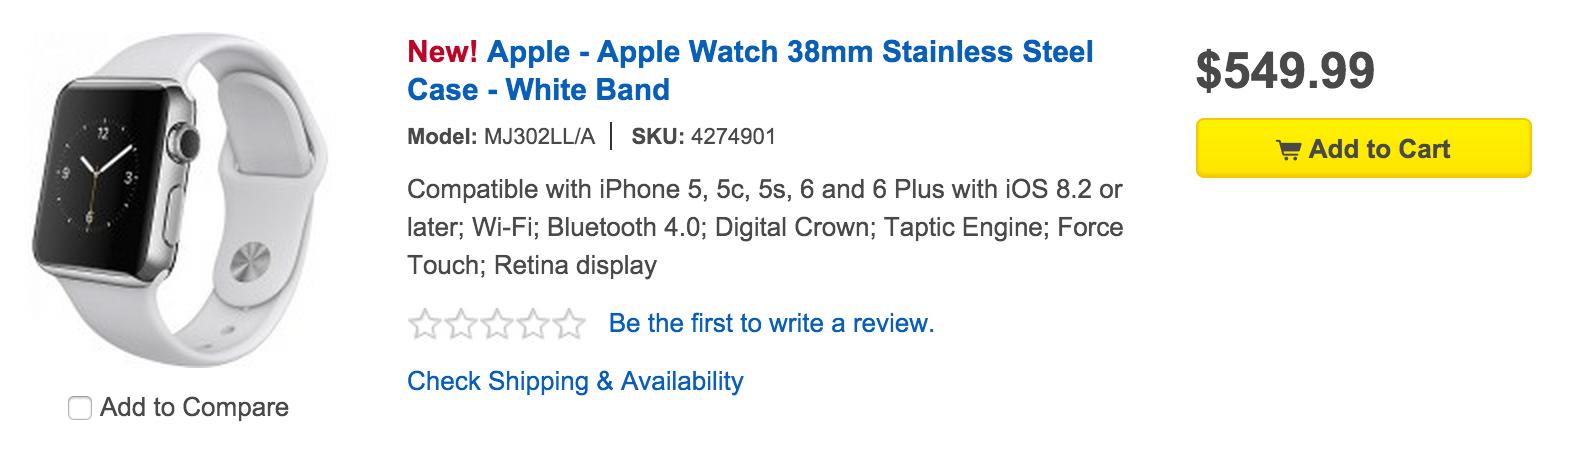 Best Buy Apple Watch Sales